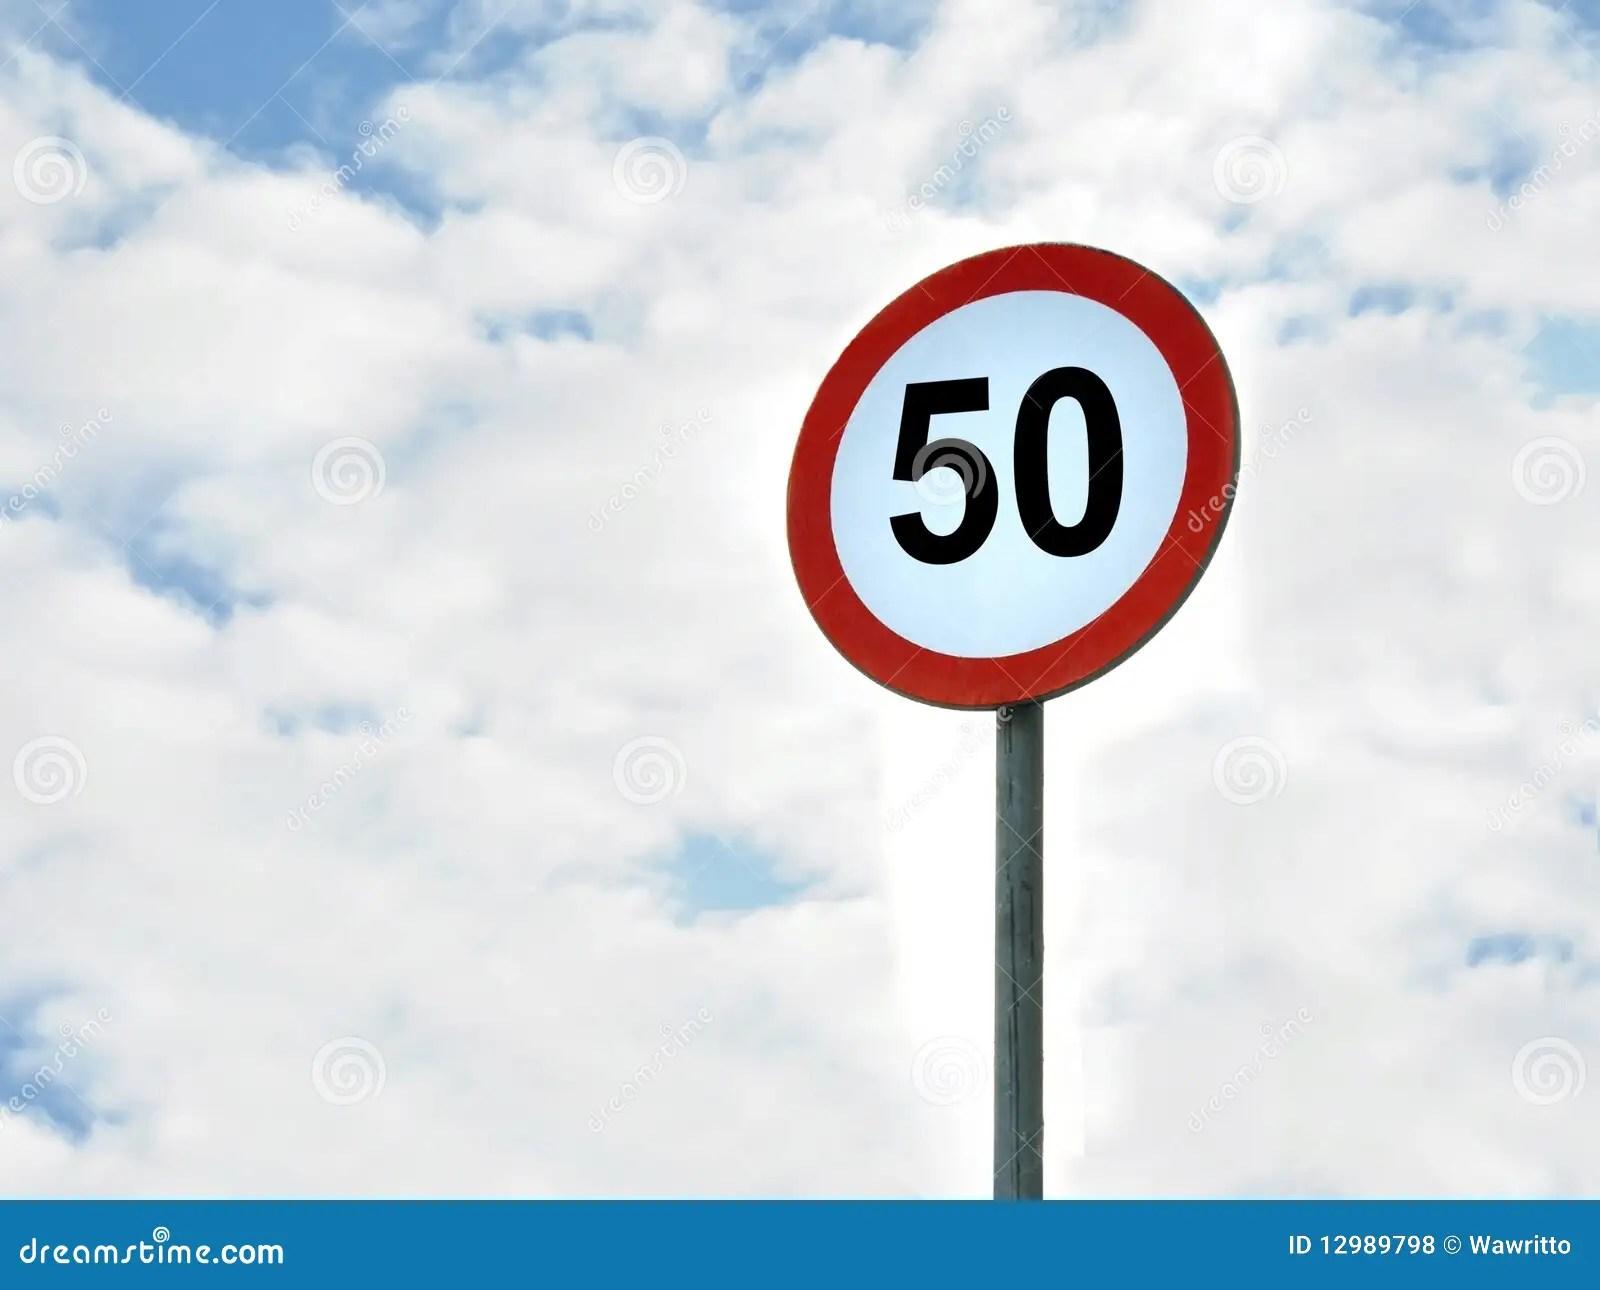 50 km h speed